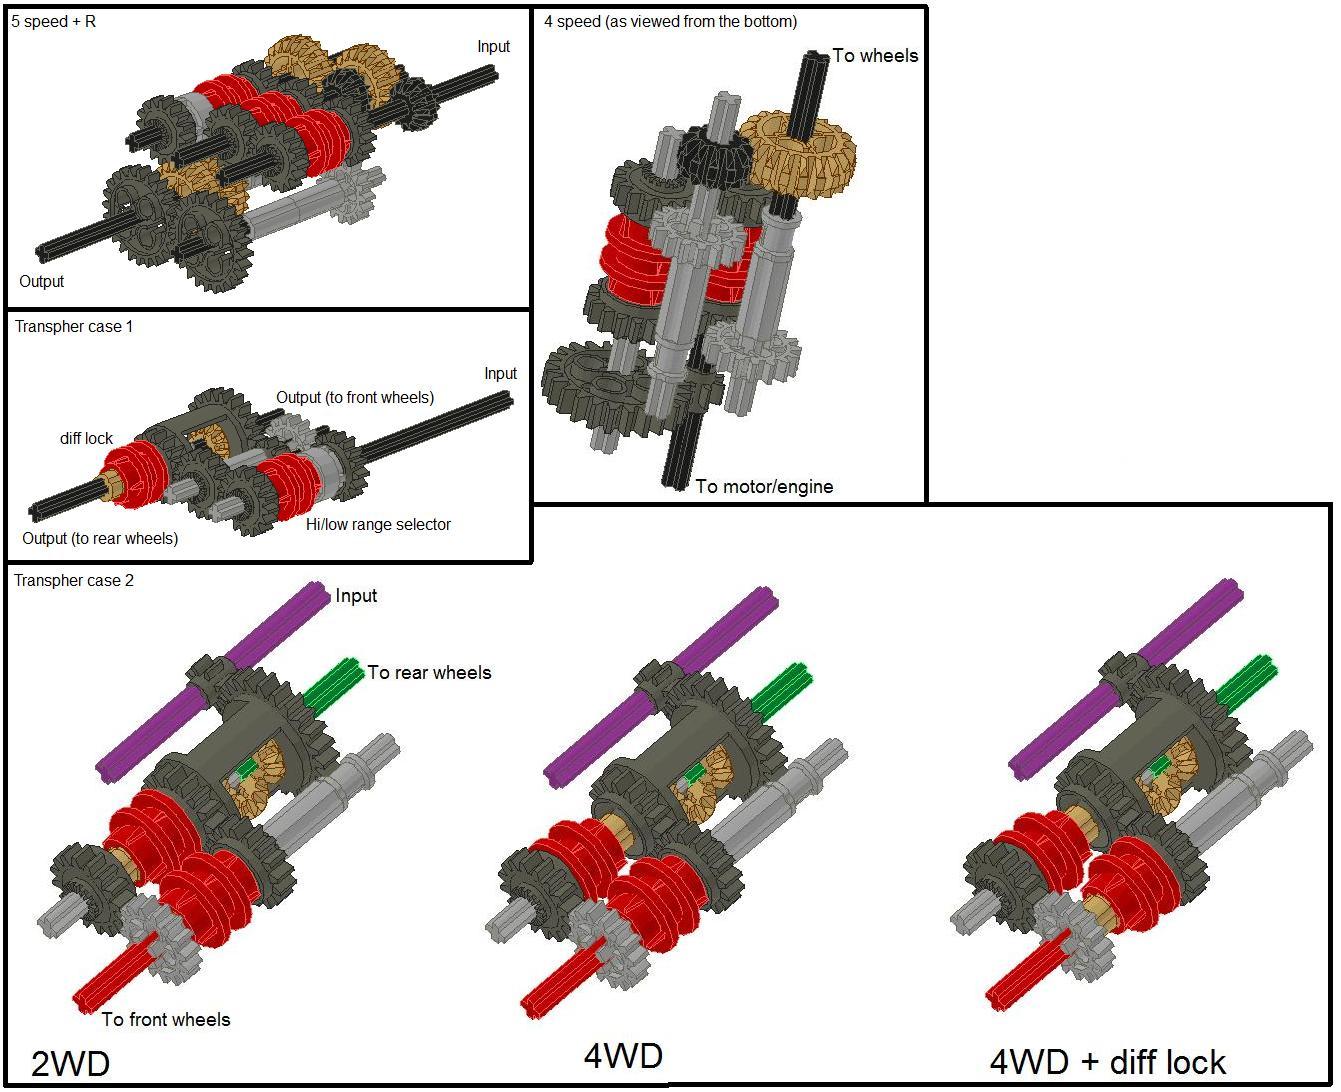 George Staples Lego Technic Transmission Tutorial Lego Technic And Model Team Eurobricks Forums